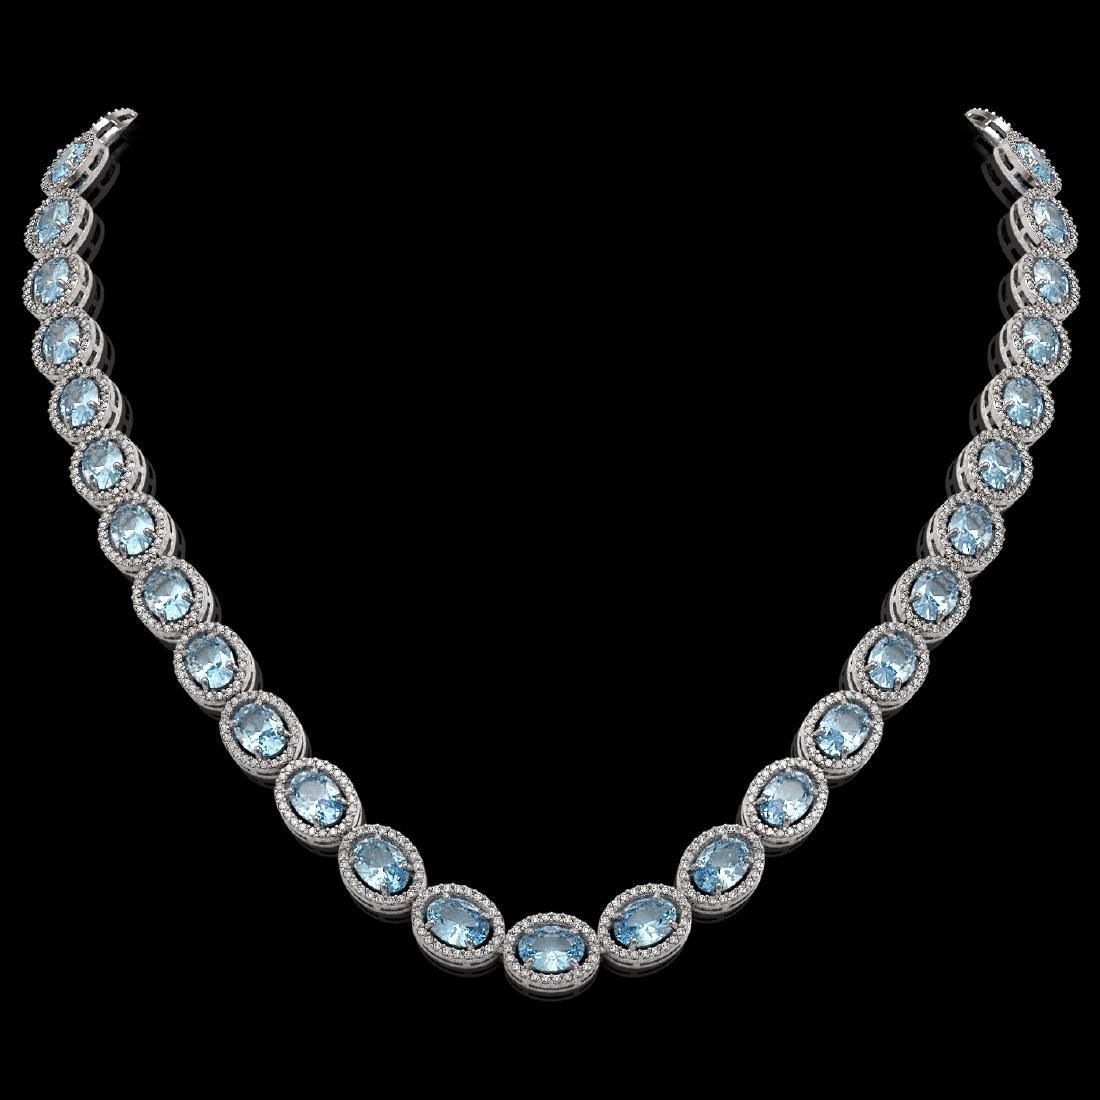 41.88 CTW Aquamarine & Diamond Halo Necklace 10K White